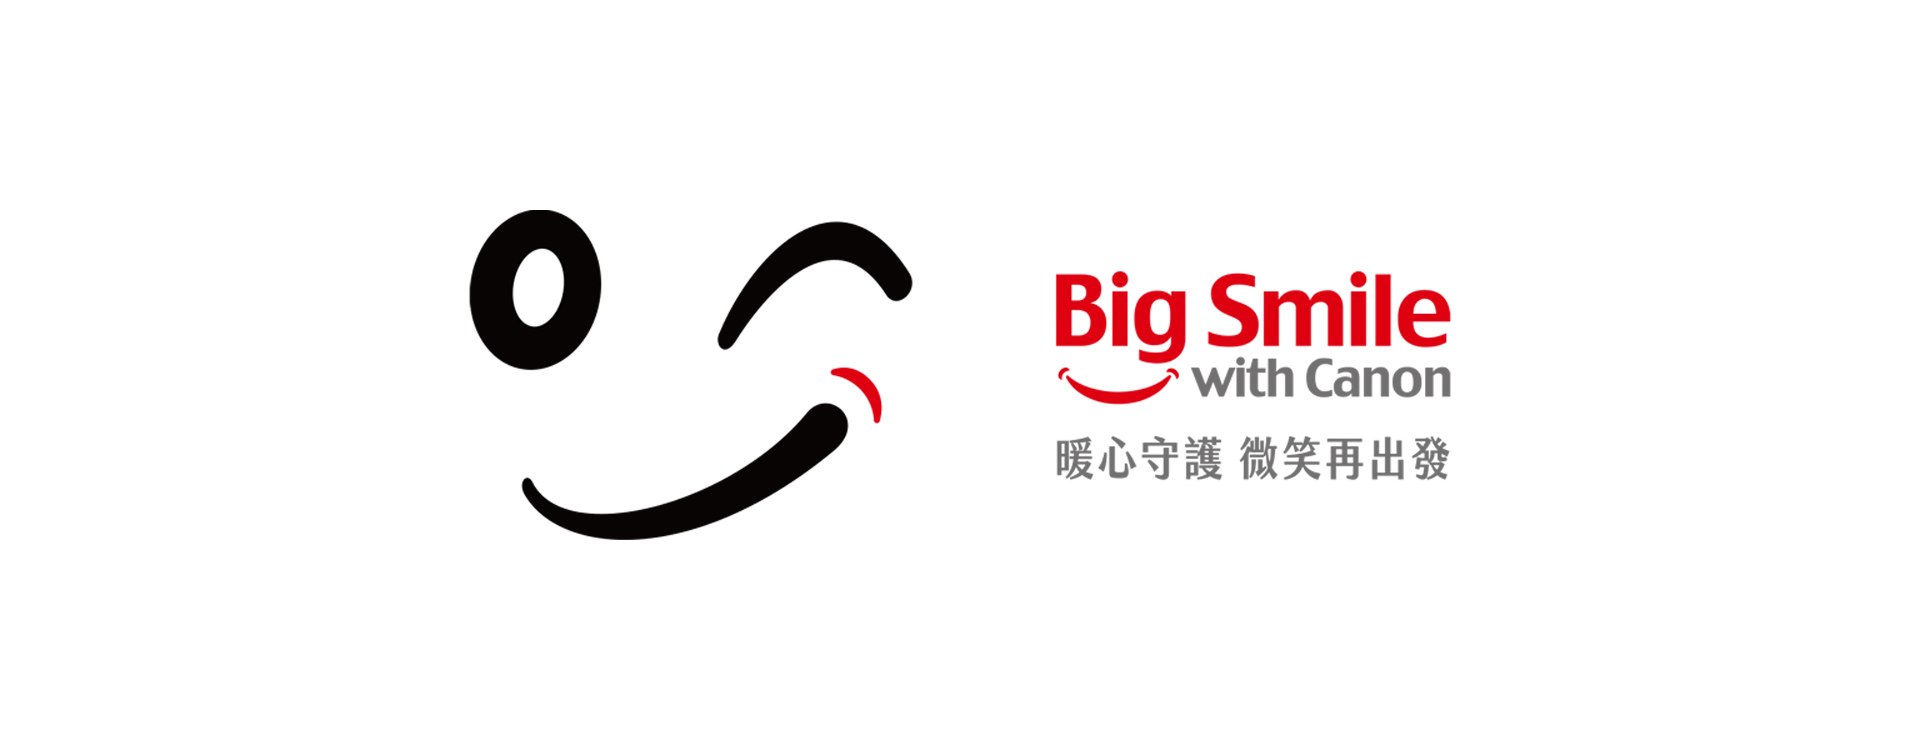 bigsmile-banner-hp.jpg